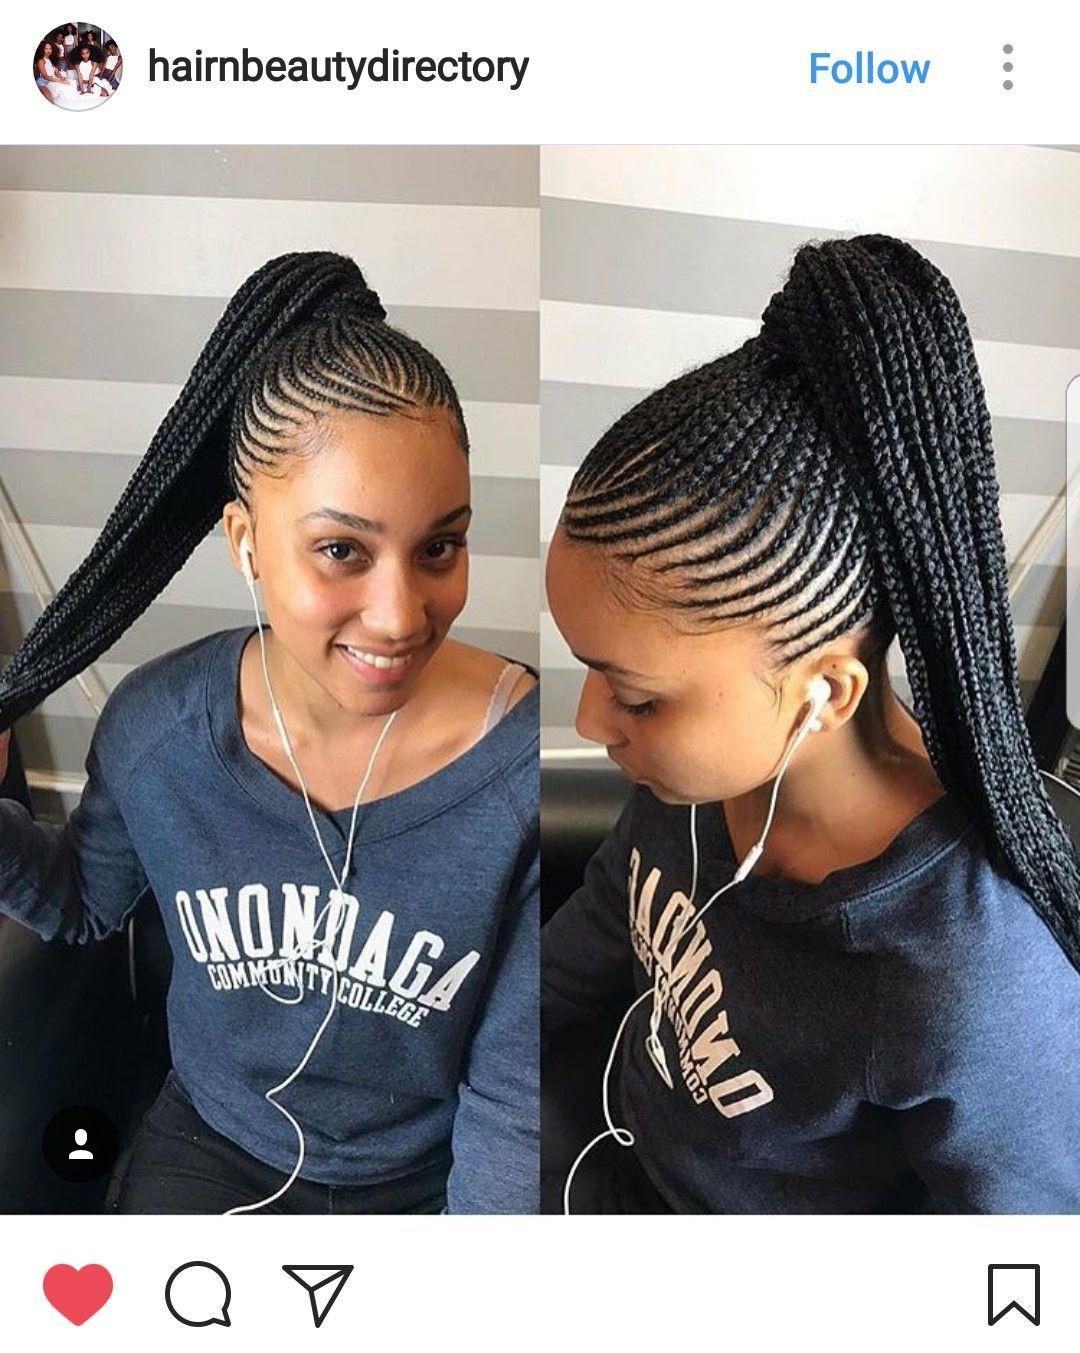 Her Braids Giving Me Alicia Keys Vibes Cornrow Hairstyles Braided Ponytail Hairstyles Braided Hairstyles